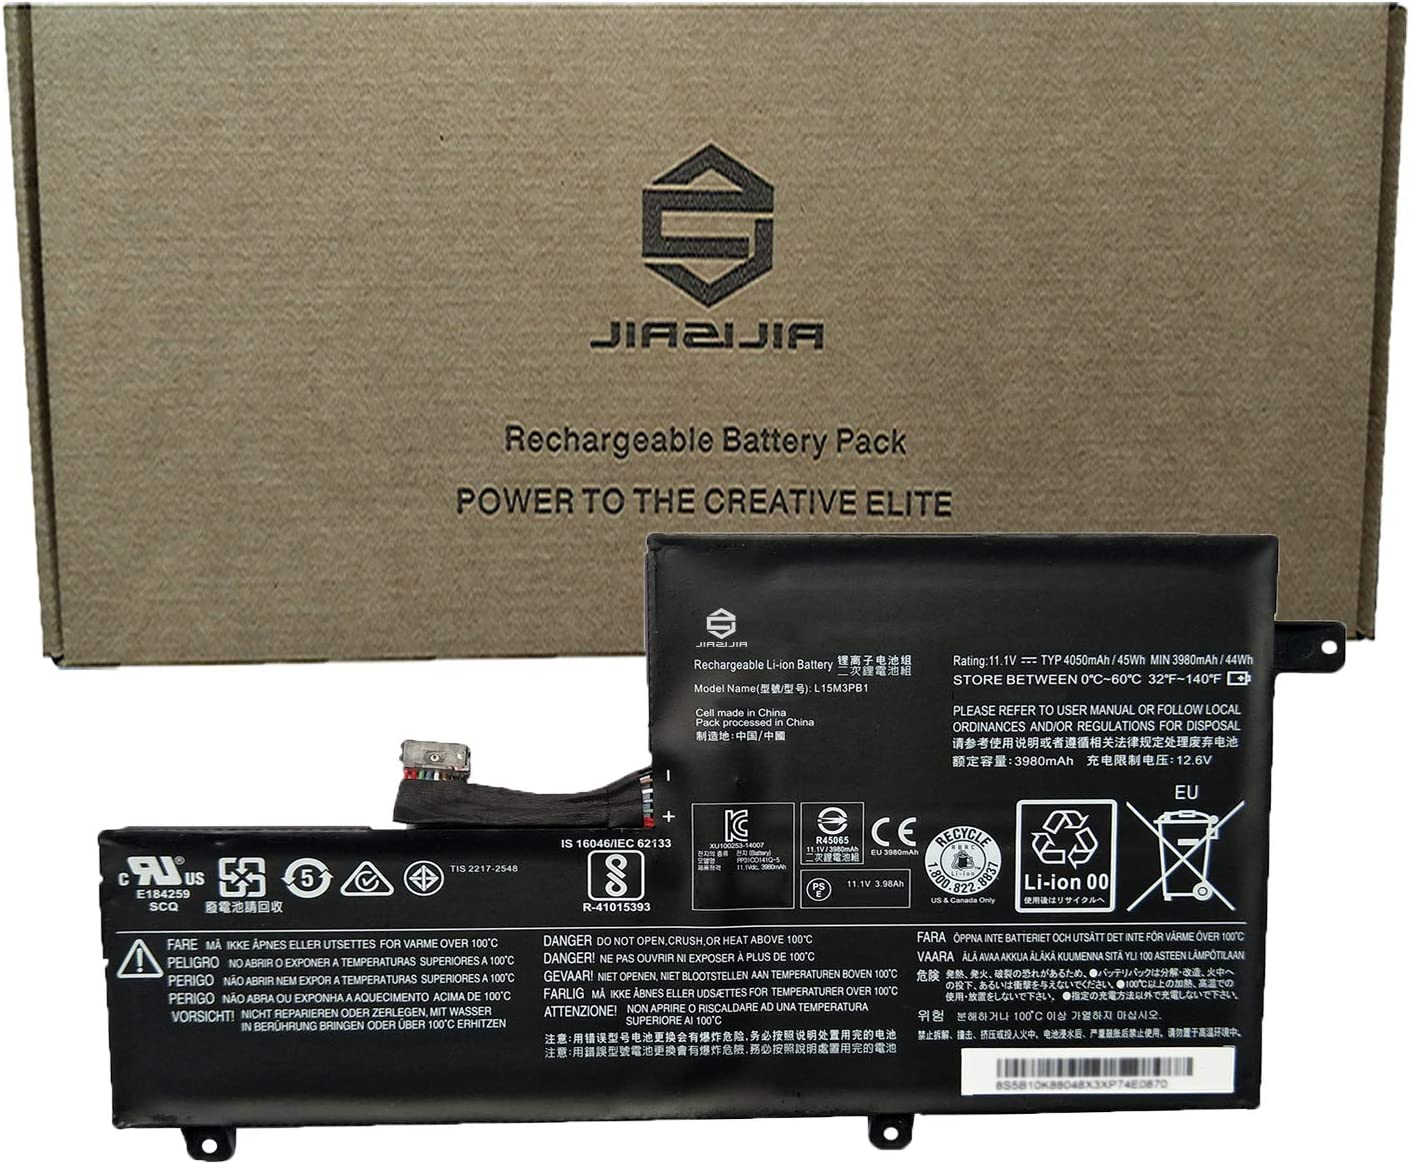 JIAZIJIA L15M3PB1 Laptop Battery Replacement for Lenovo N22 N22-10 N22-20 N22 Touch N23 N23 Touch N23 Yoga N42 N42-20 Chromebook C330 S330 Series Notebook L15L3PB1 11.1V 45Wh 4050mAh